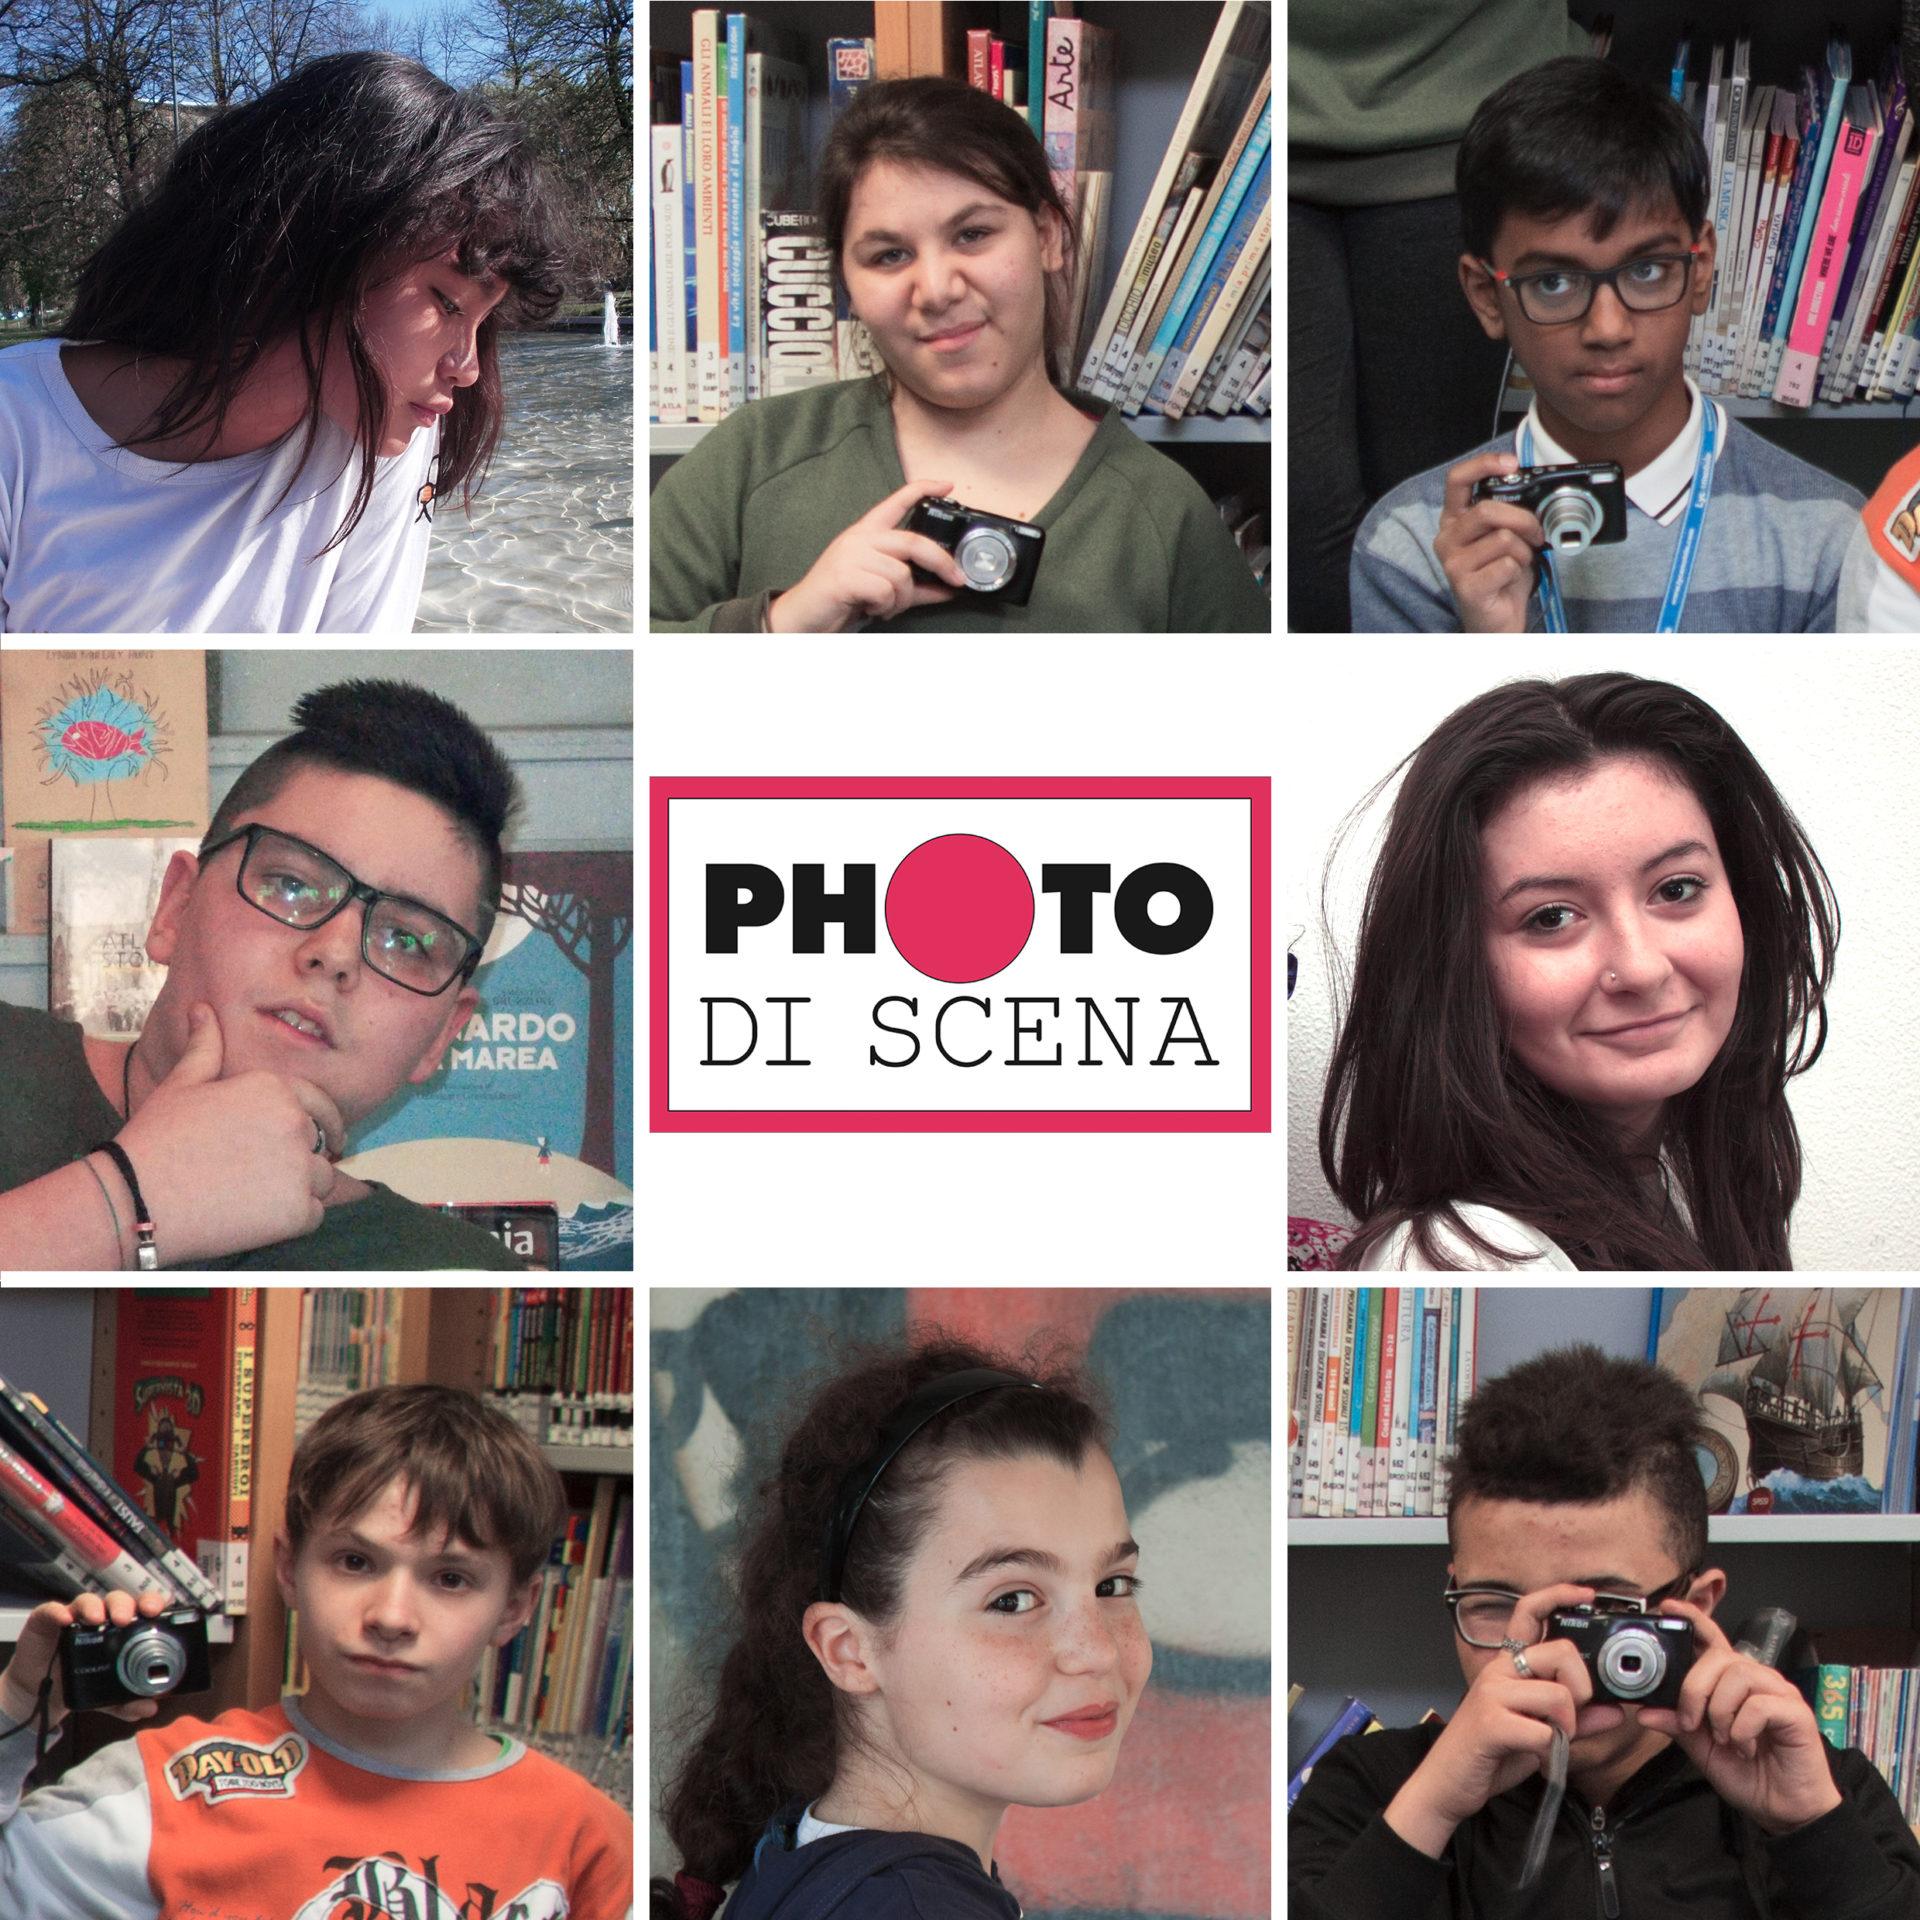 per photofestival - Milano Photofestival